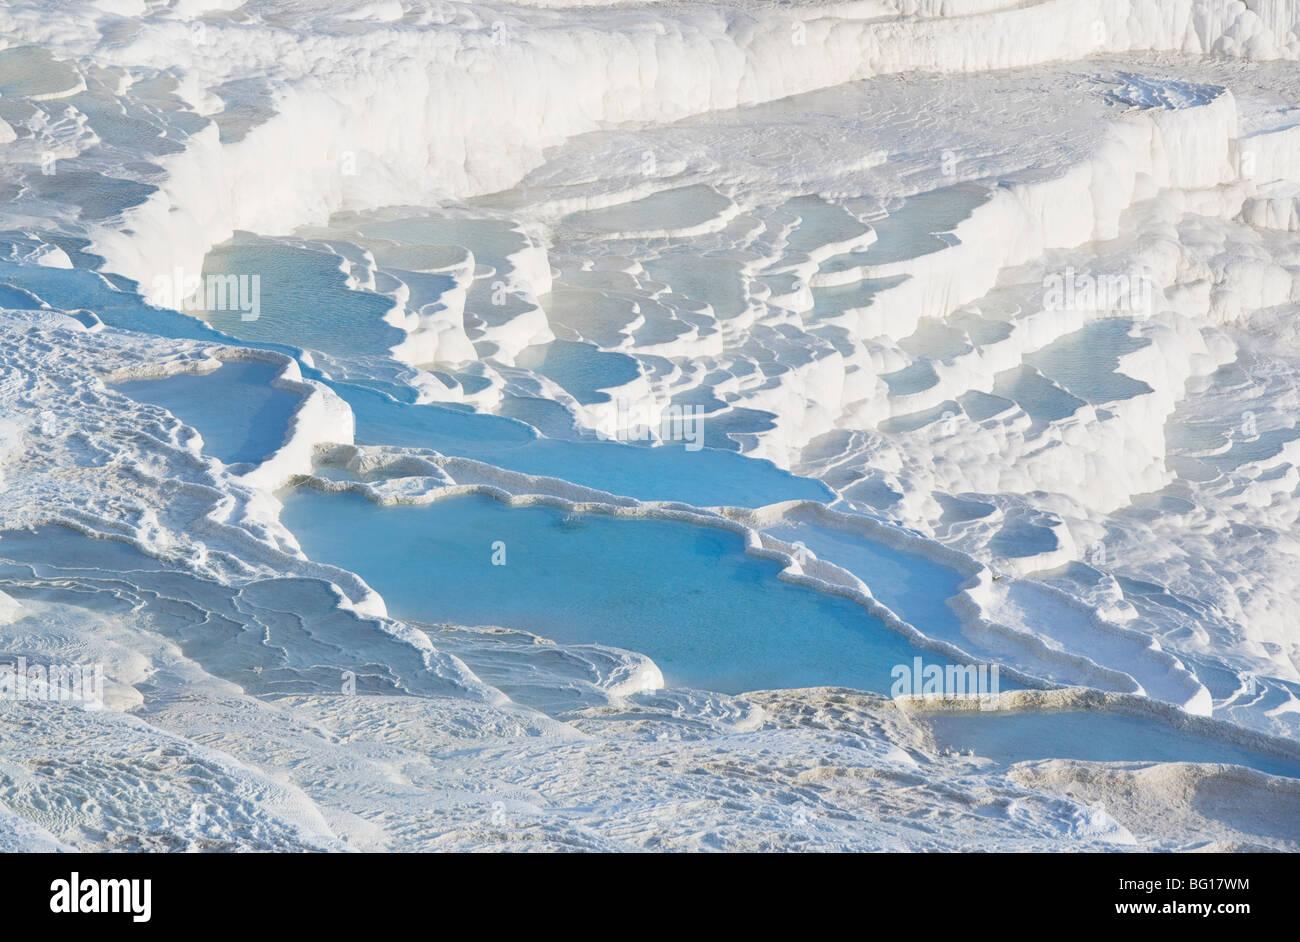 Terraced thermal pools, Pamukkale, UNESCO World Heritage Site, Anatolia, Turkey, Asia Minor, Eurasia - Stock Image